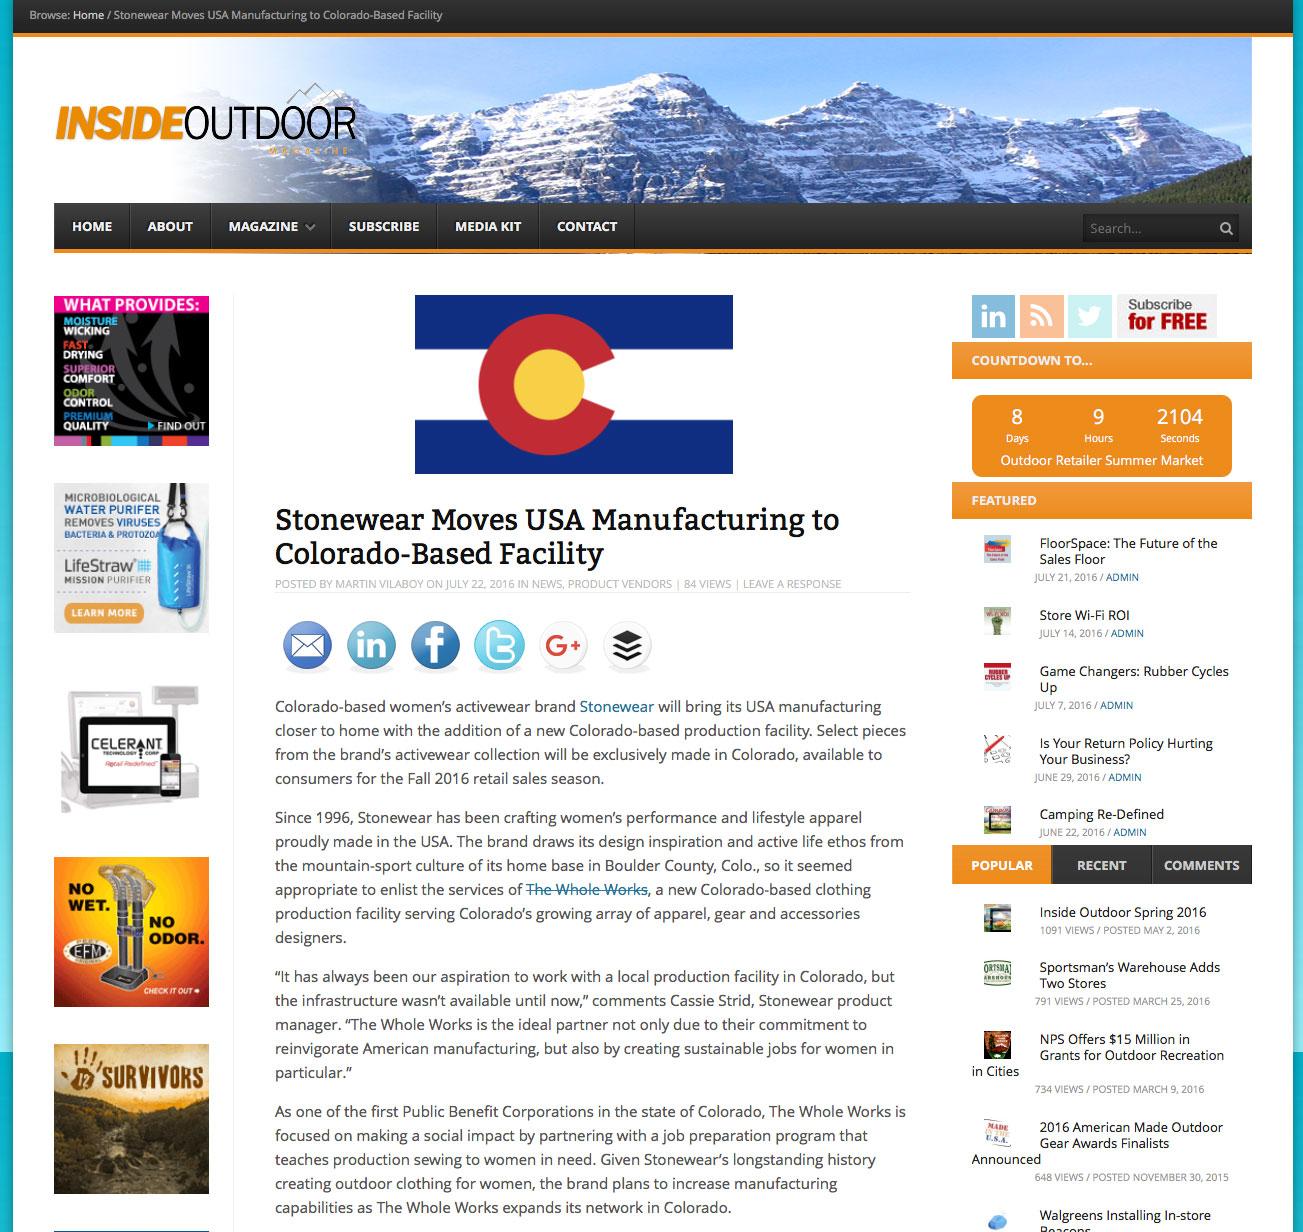 Stonewear Moves USA Manufacturing to Colorado-Based Facility